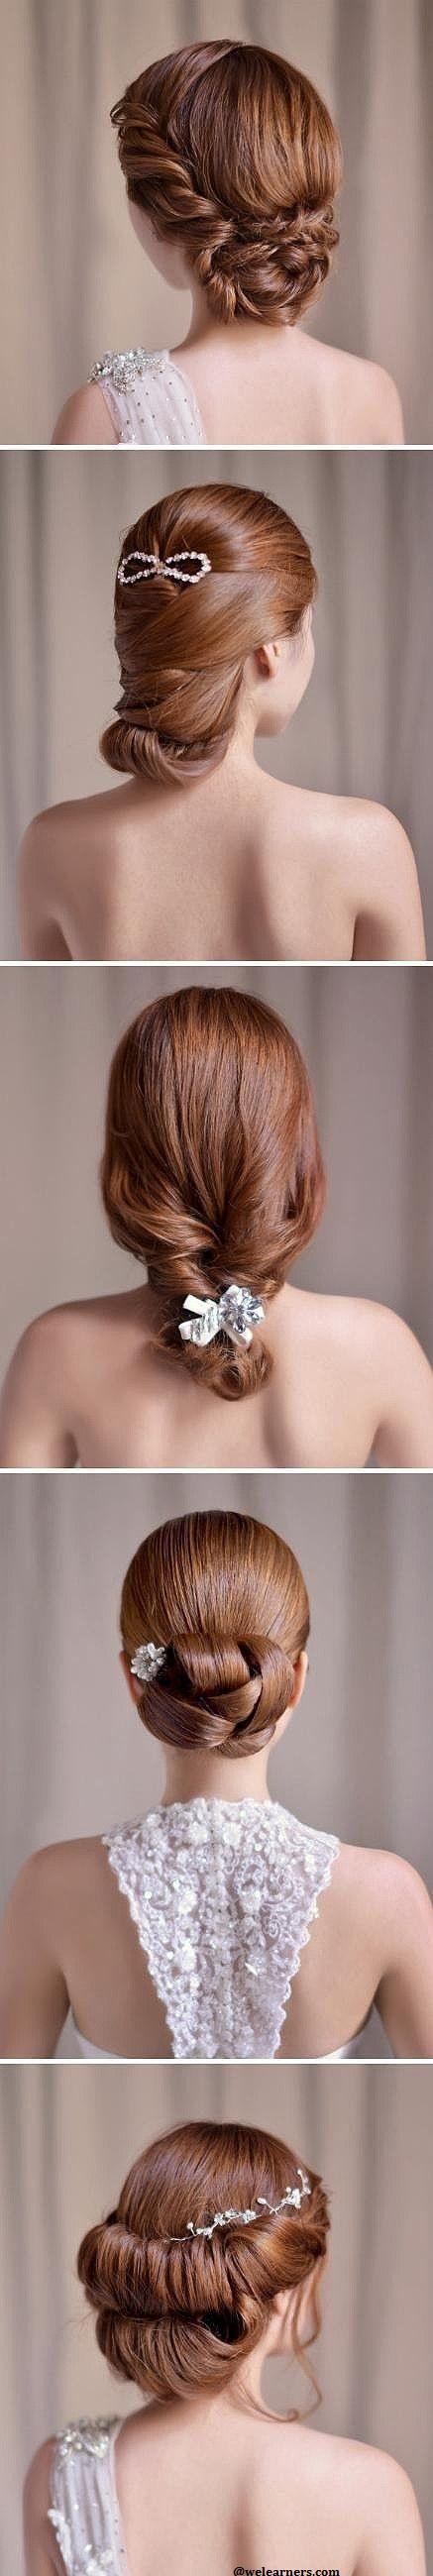 coiffure-soirée-14